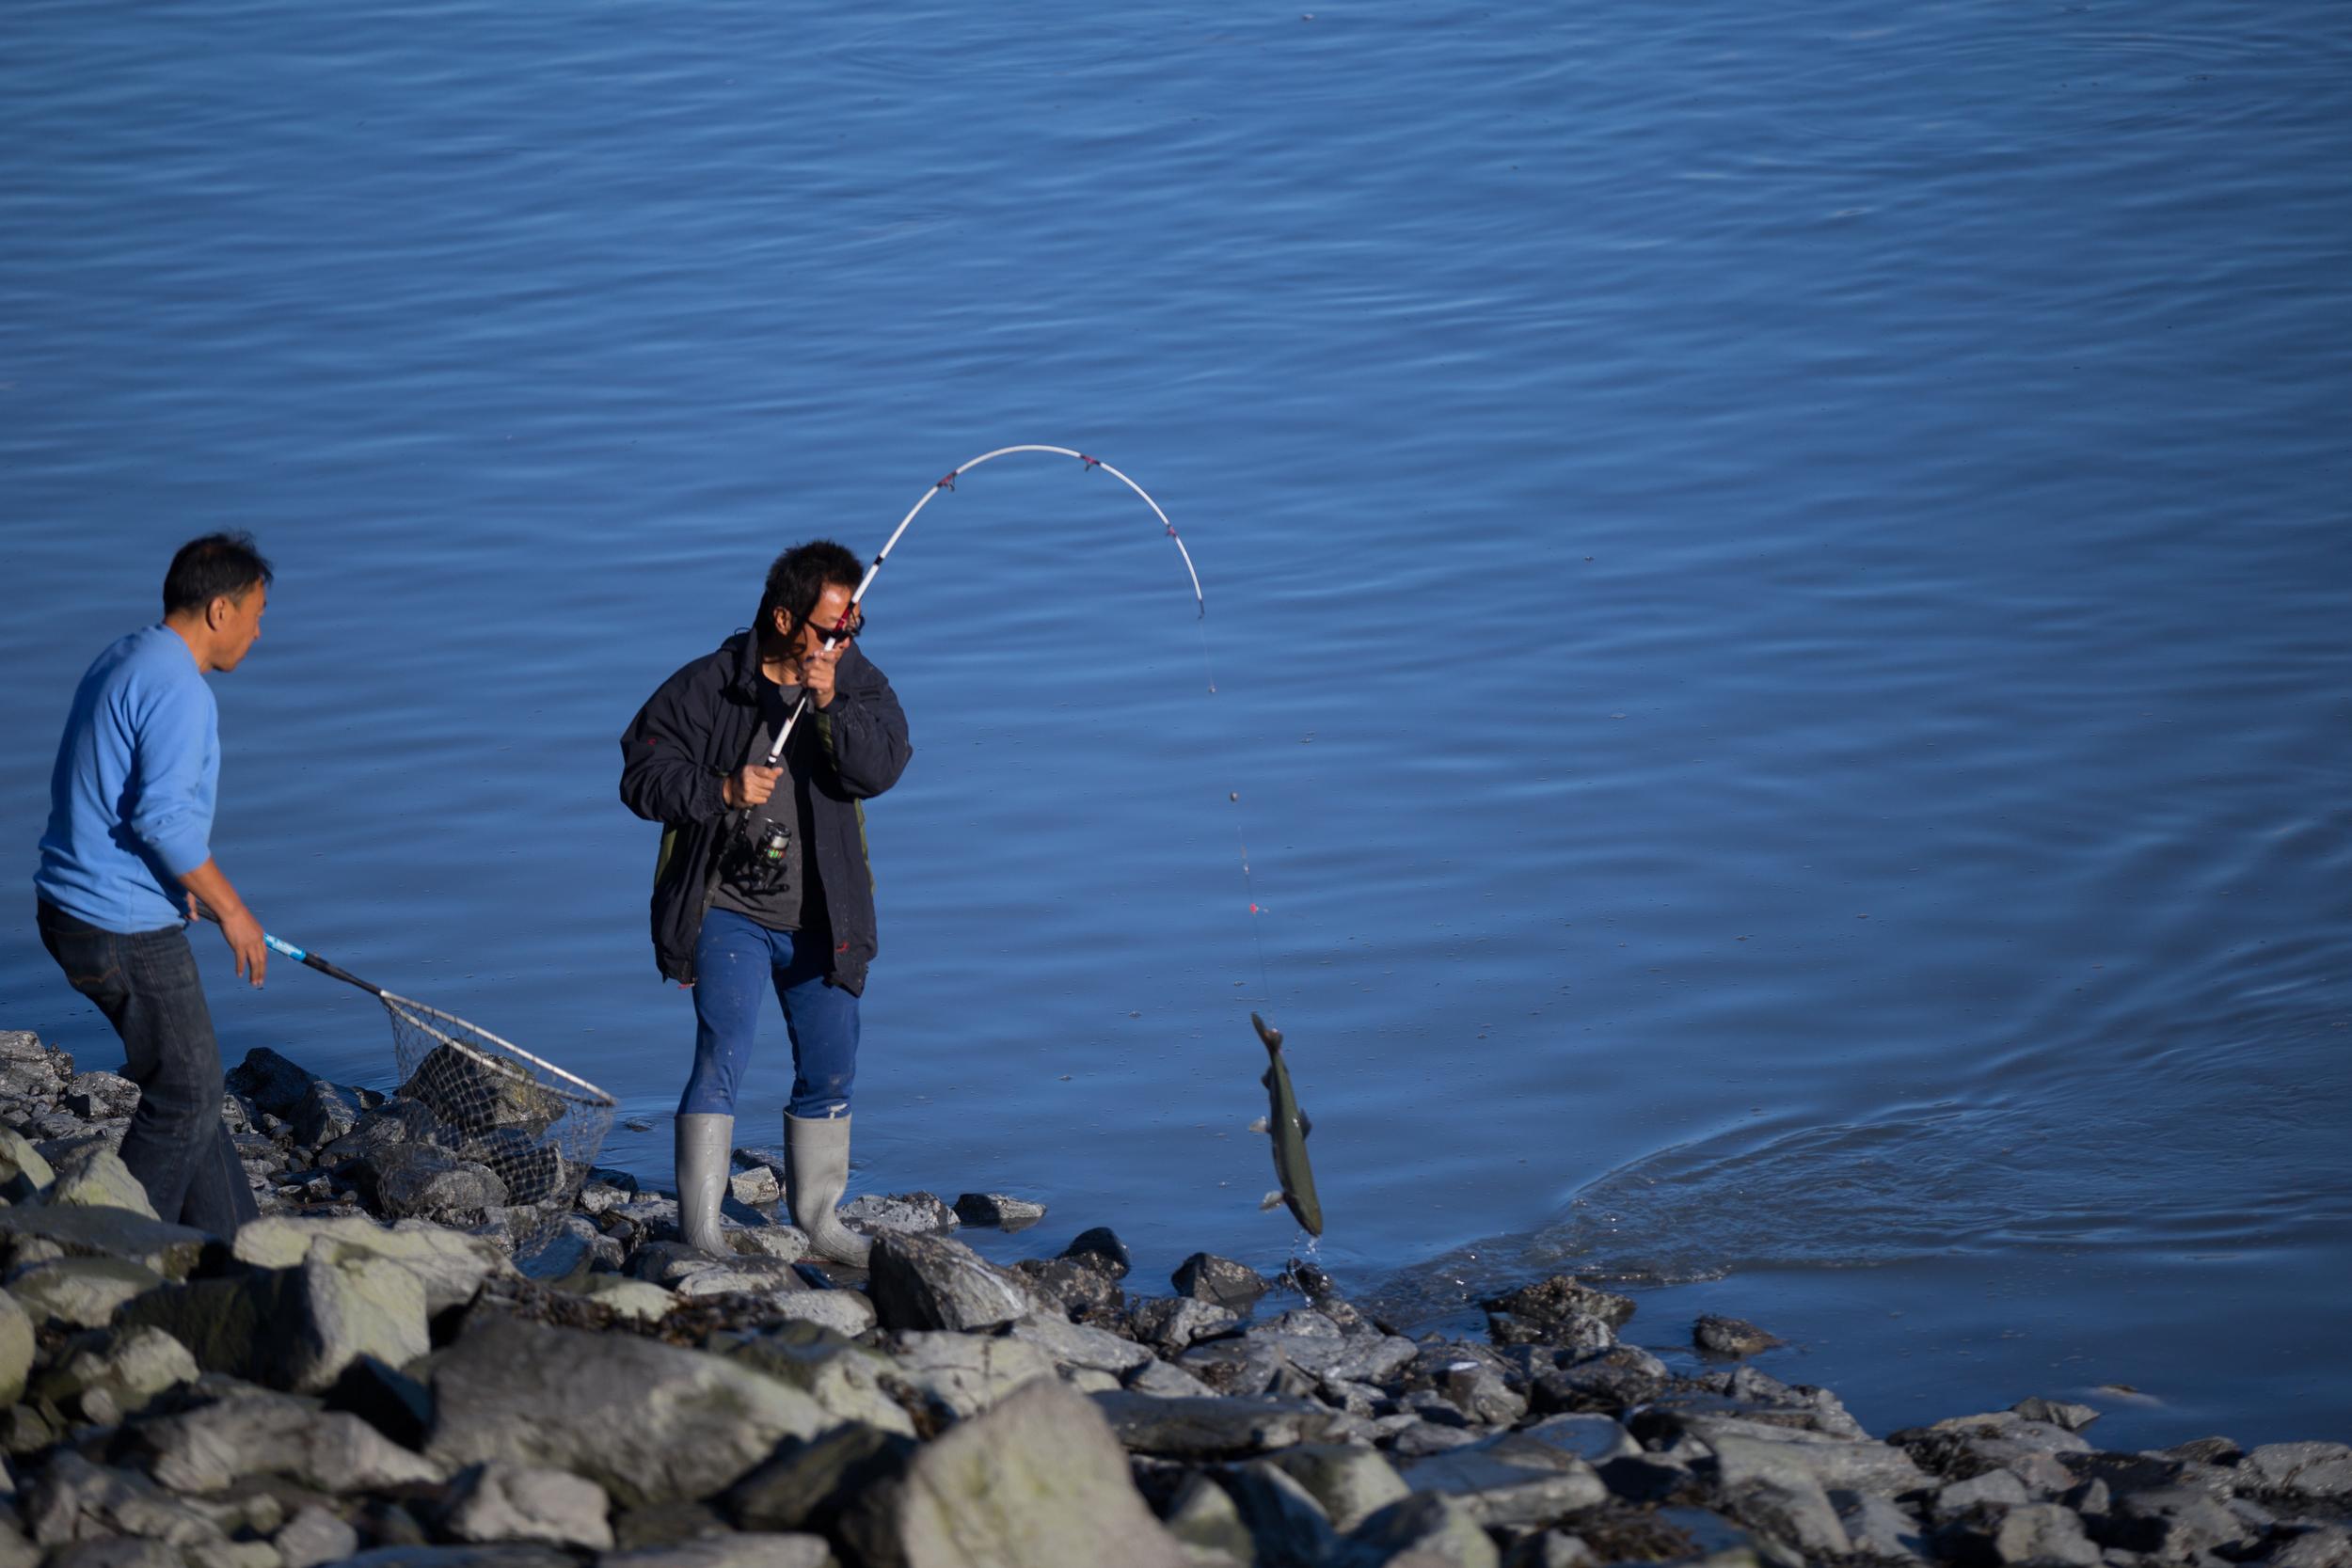 Fisherman near the salmon hatchery, Valdez, Alaska